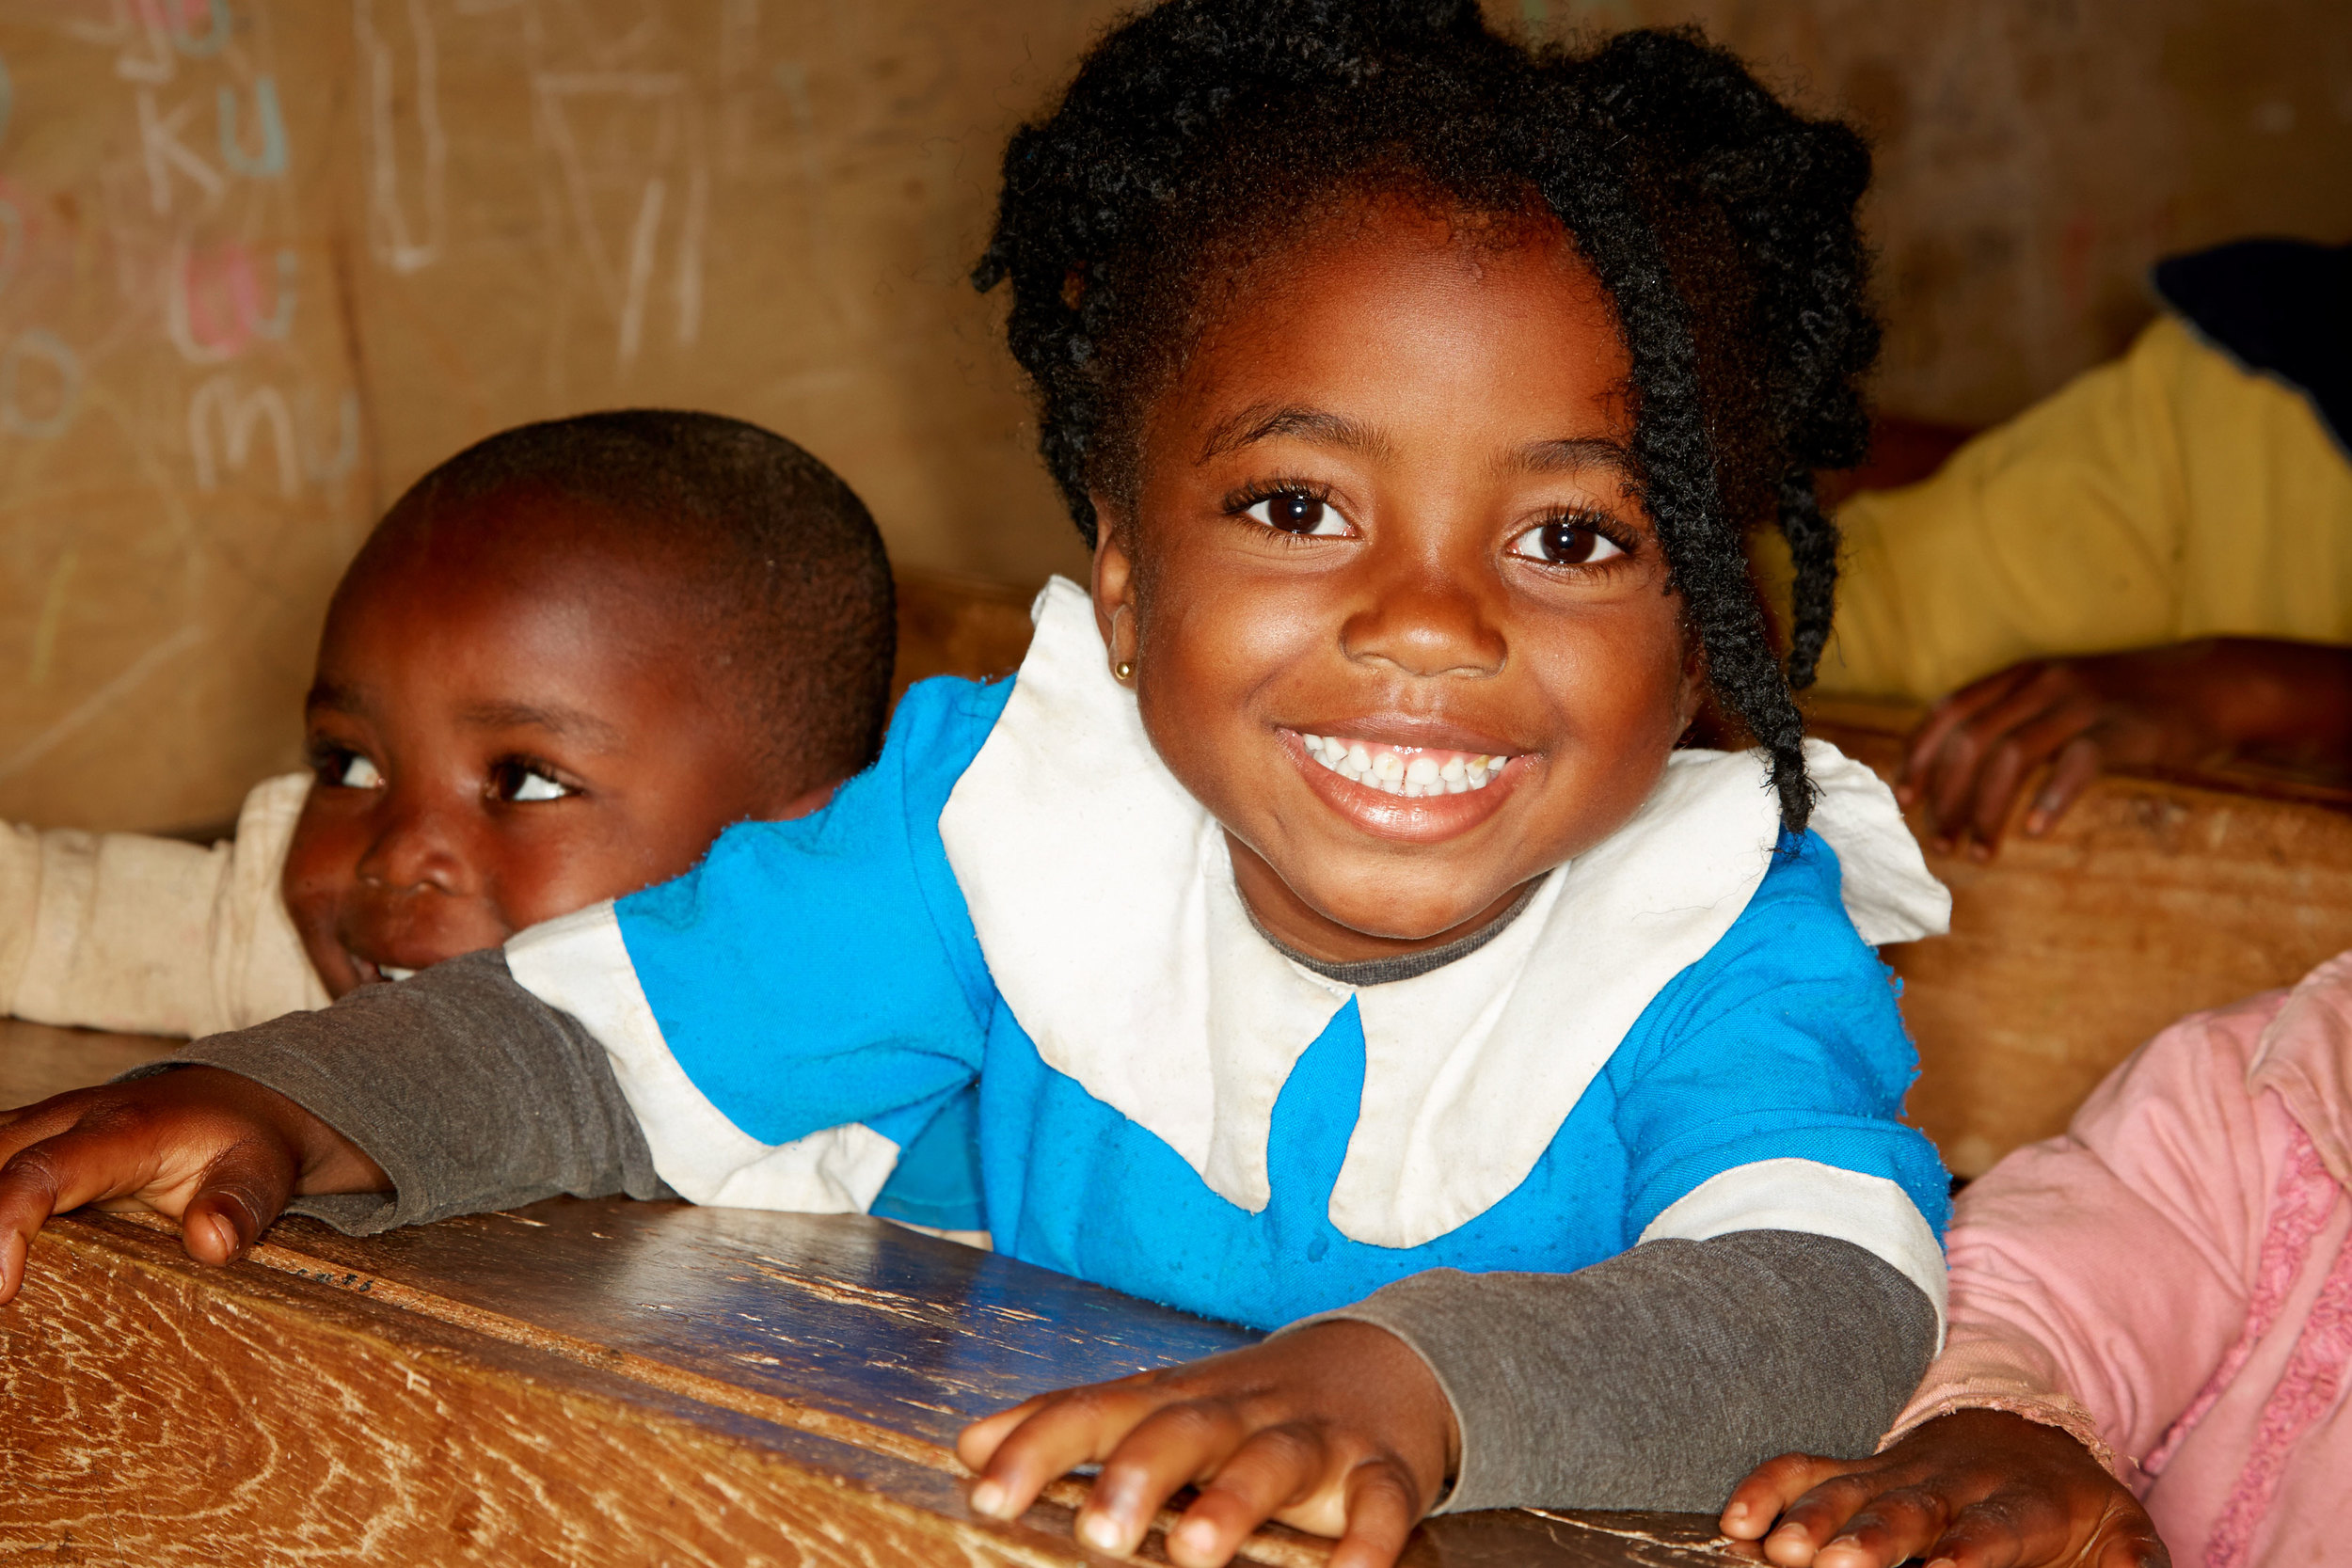 MBEWELA, CAMEROON